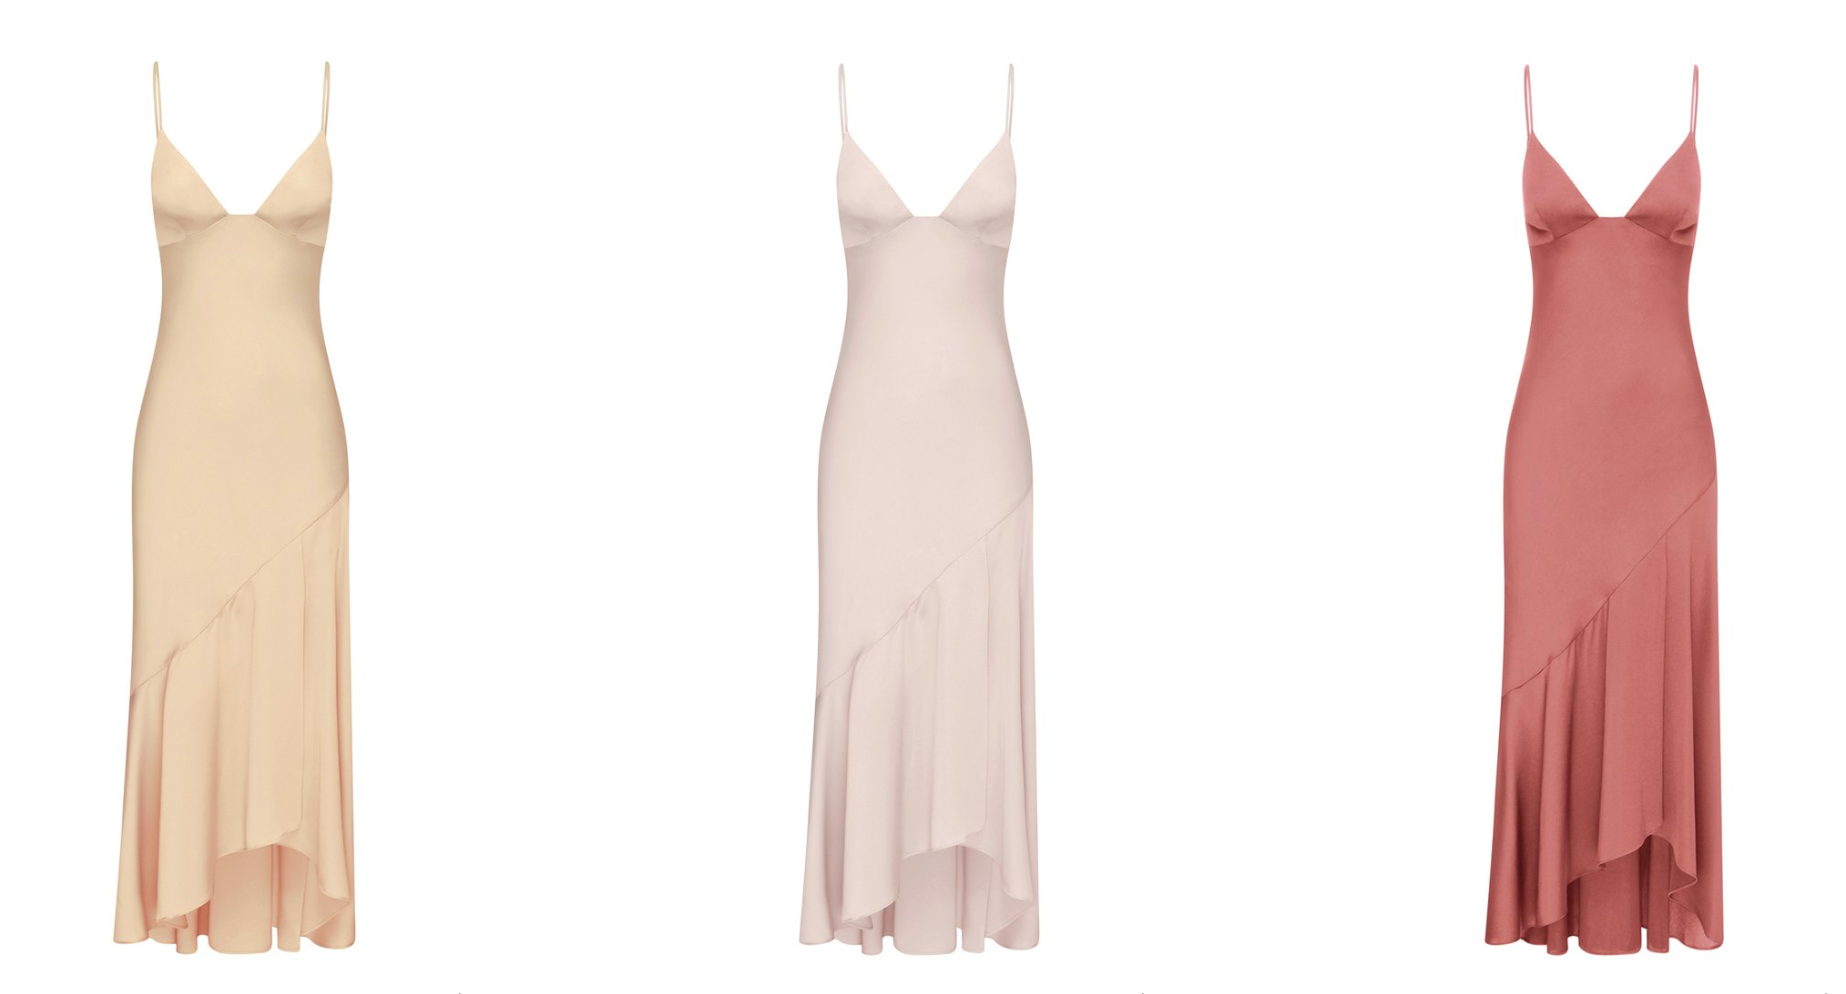 LUXE BIAS ASYMMETRICAL SLIP DRESS - Shona Joy featured on LOVE FIND CO.